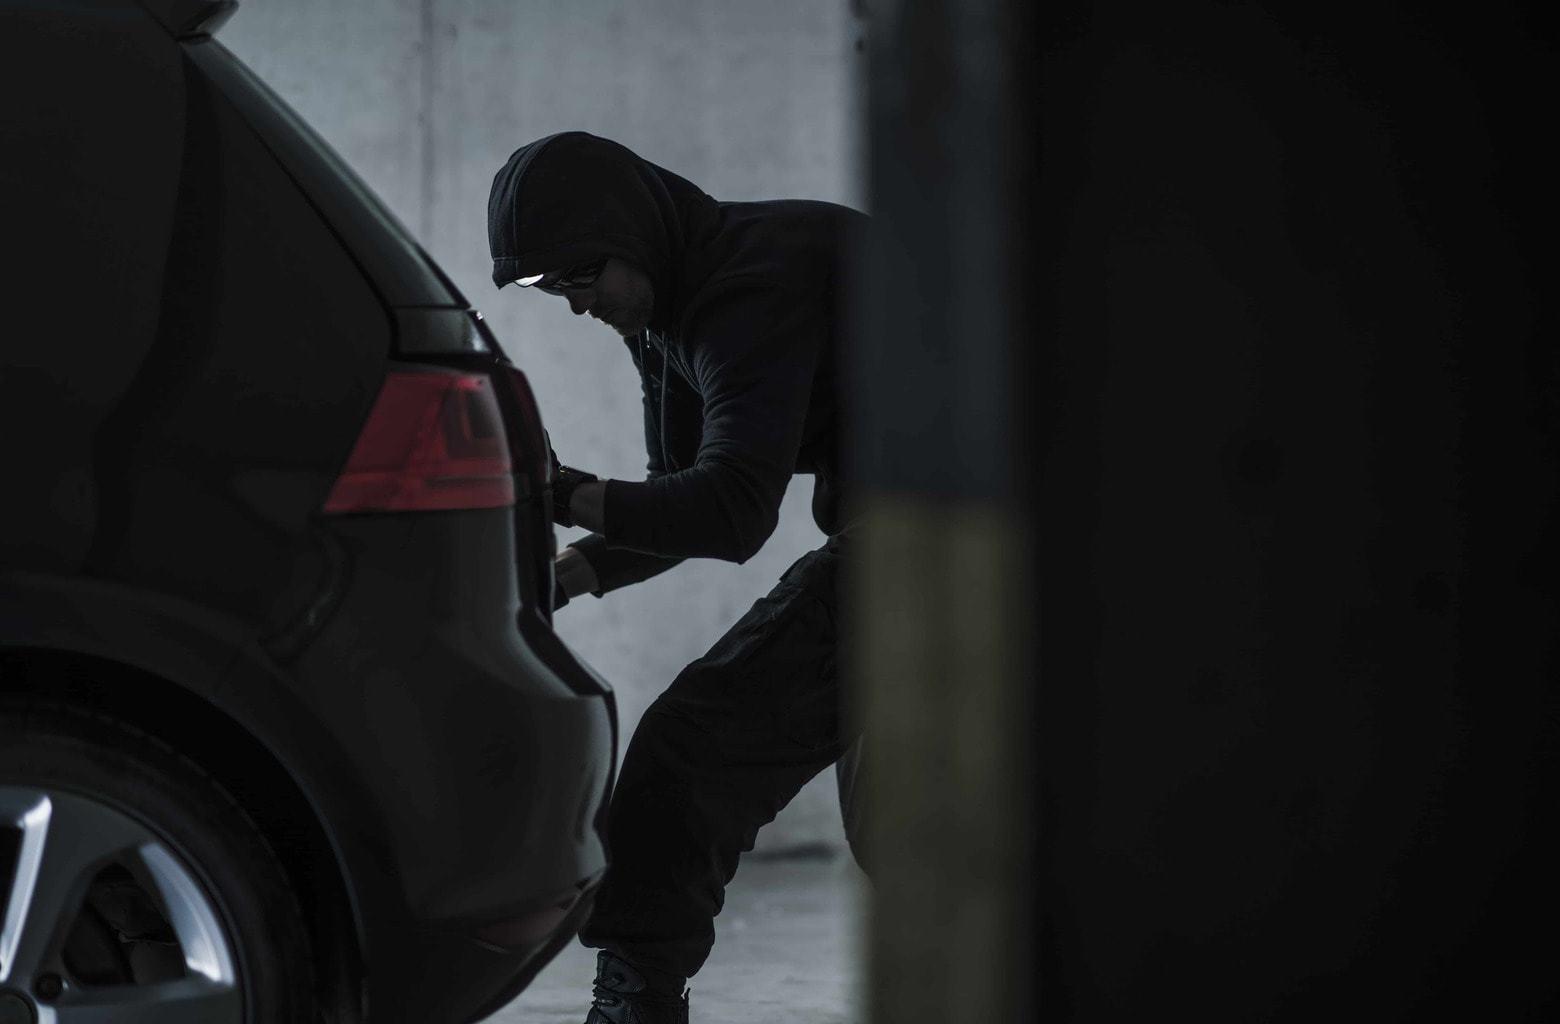 Motor Vehicle Theft in Arizona